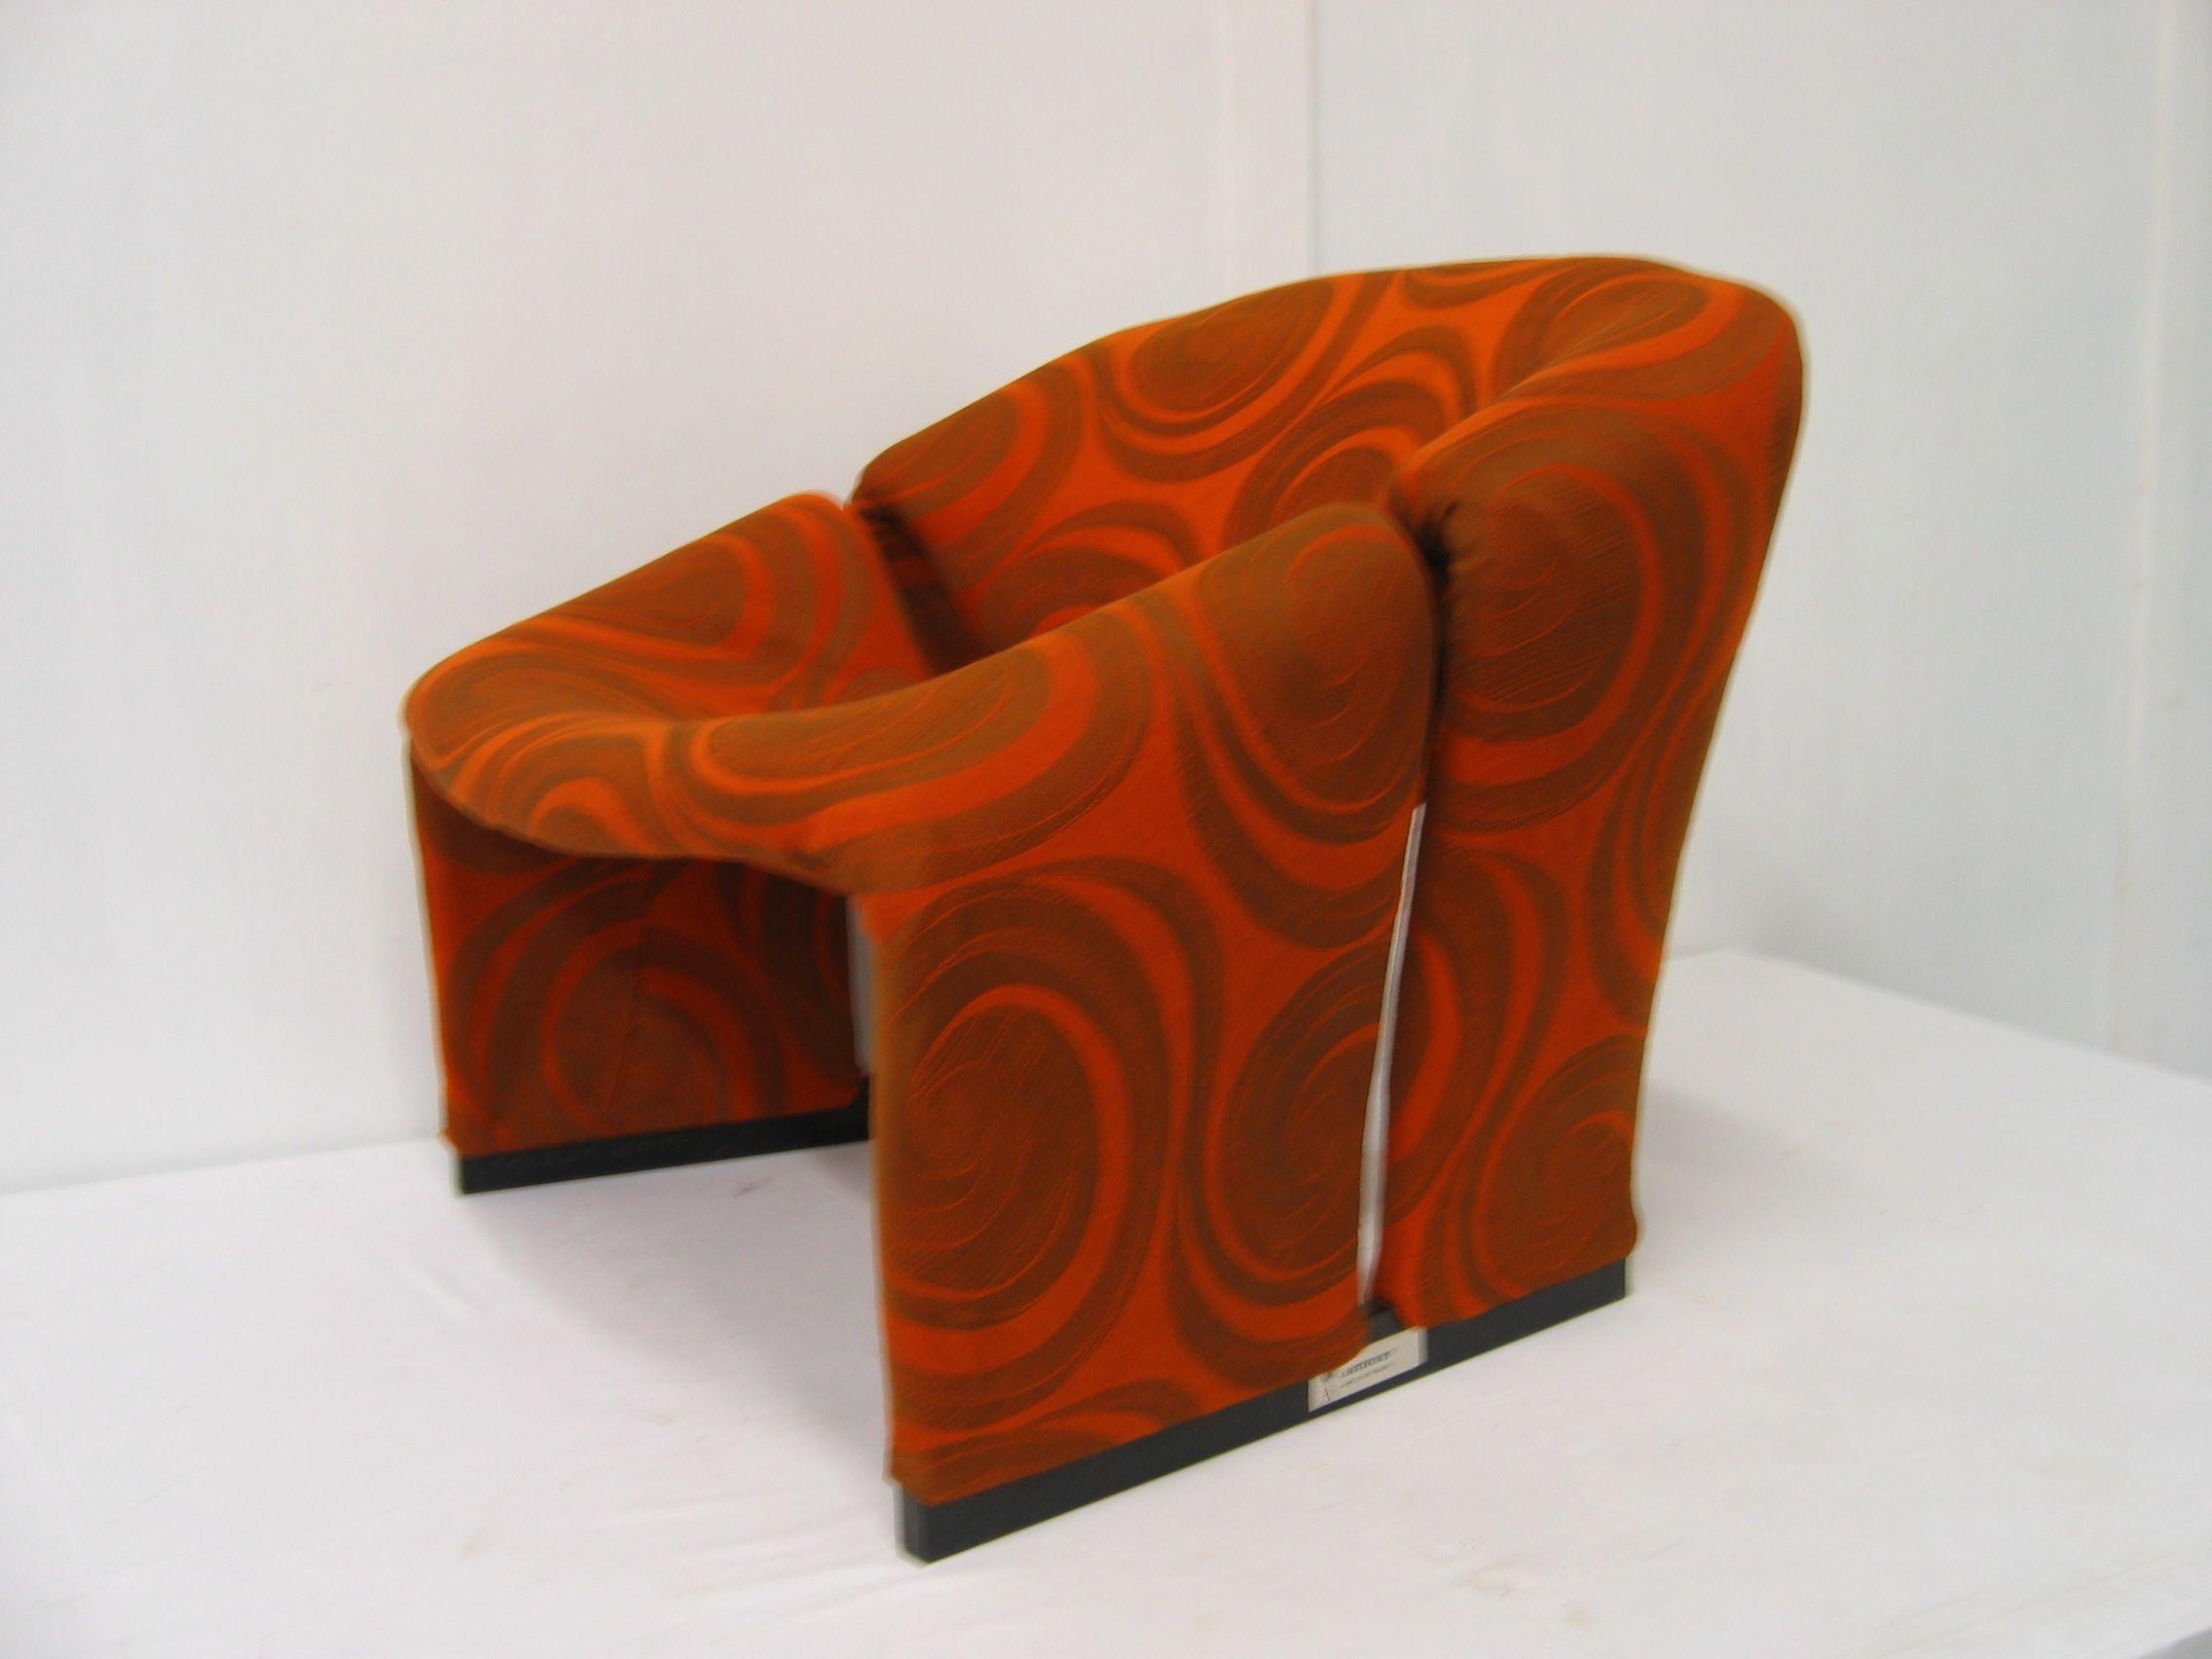 Vintage Artifort Lounge Chair